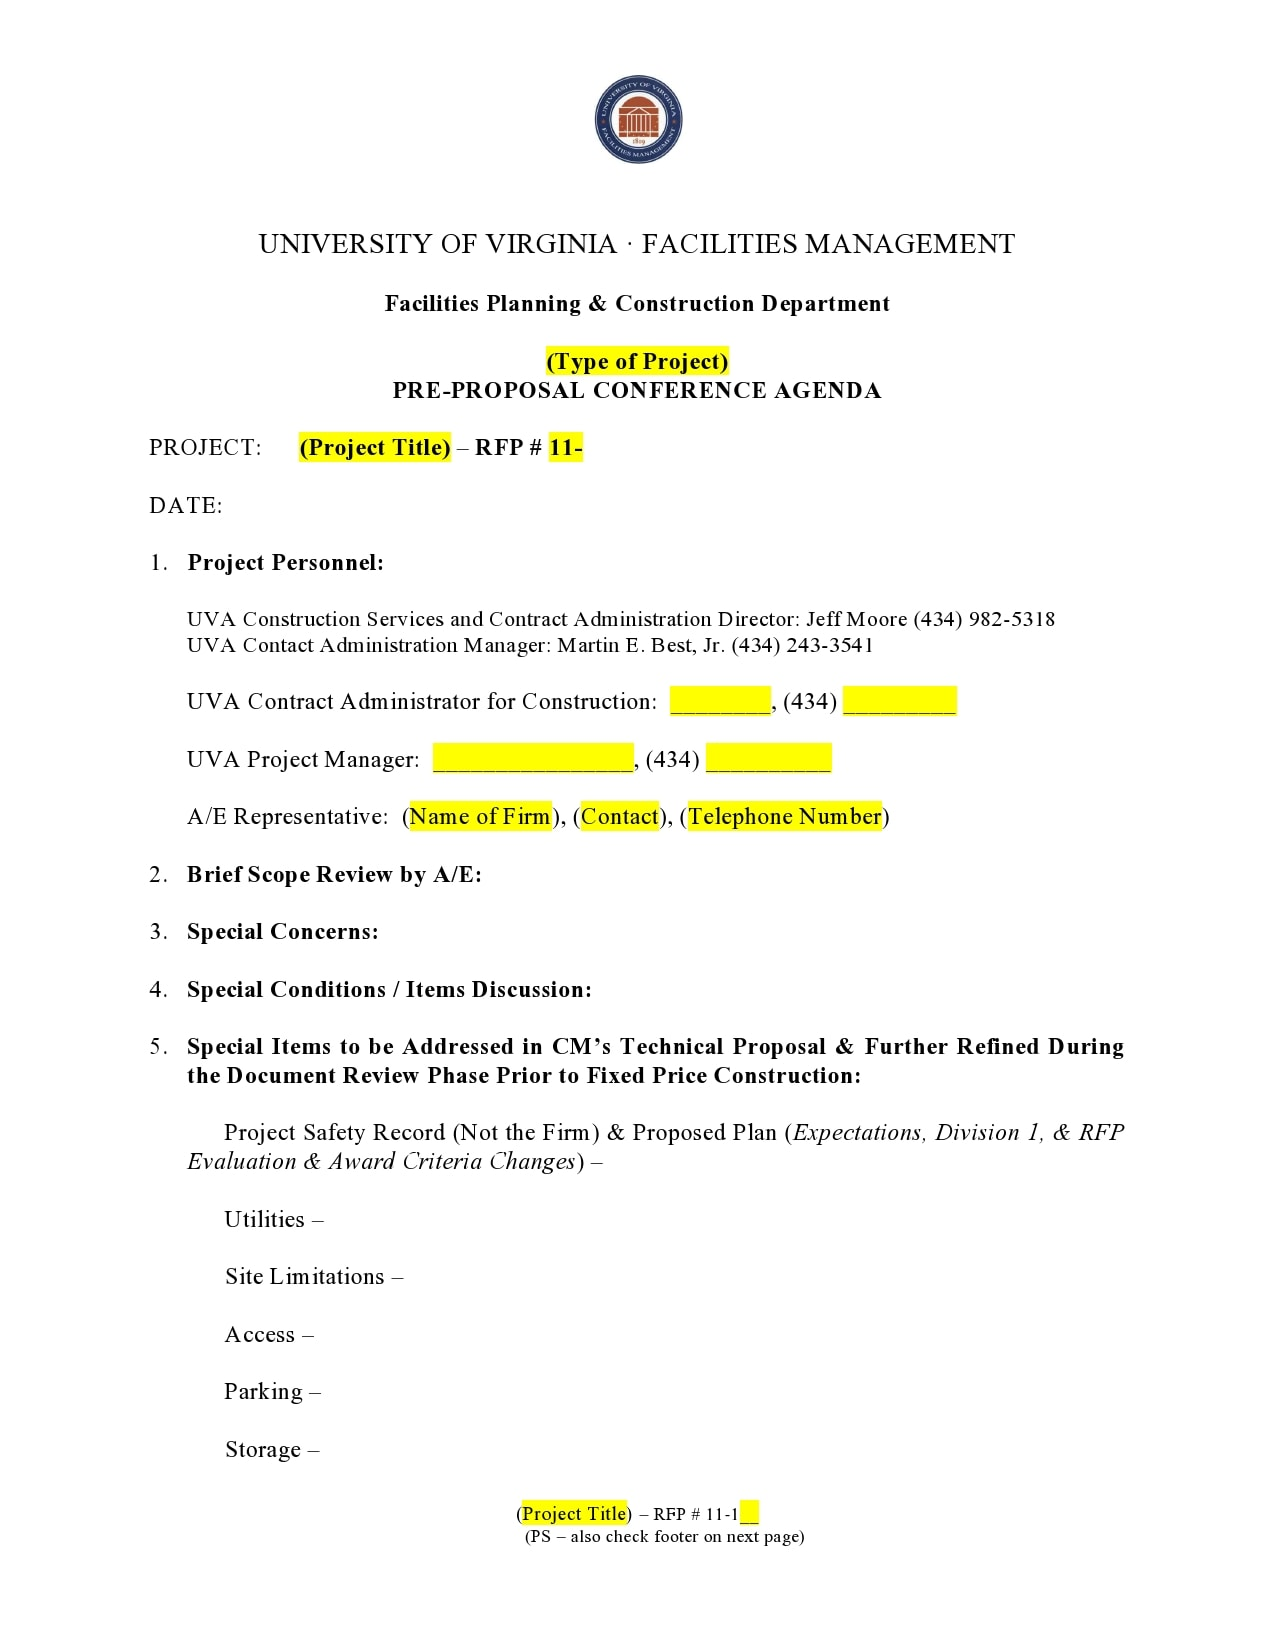 conference agenda template 09